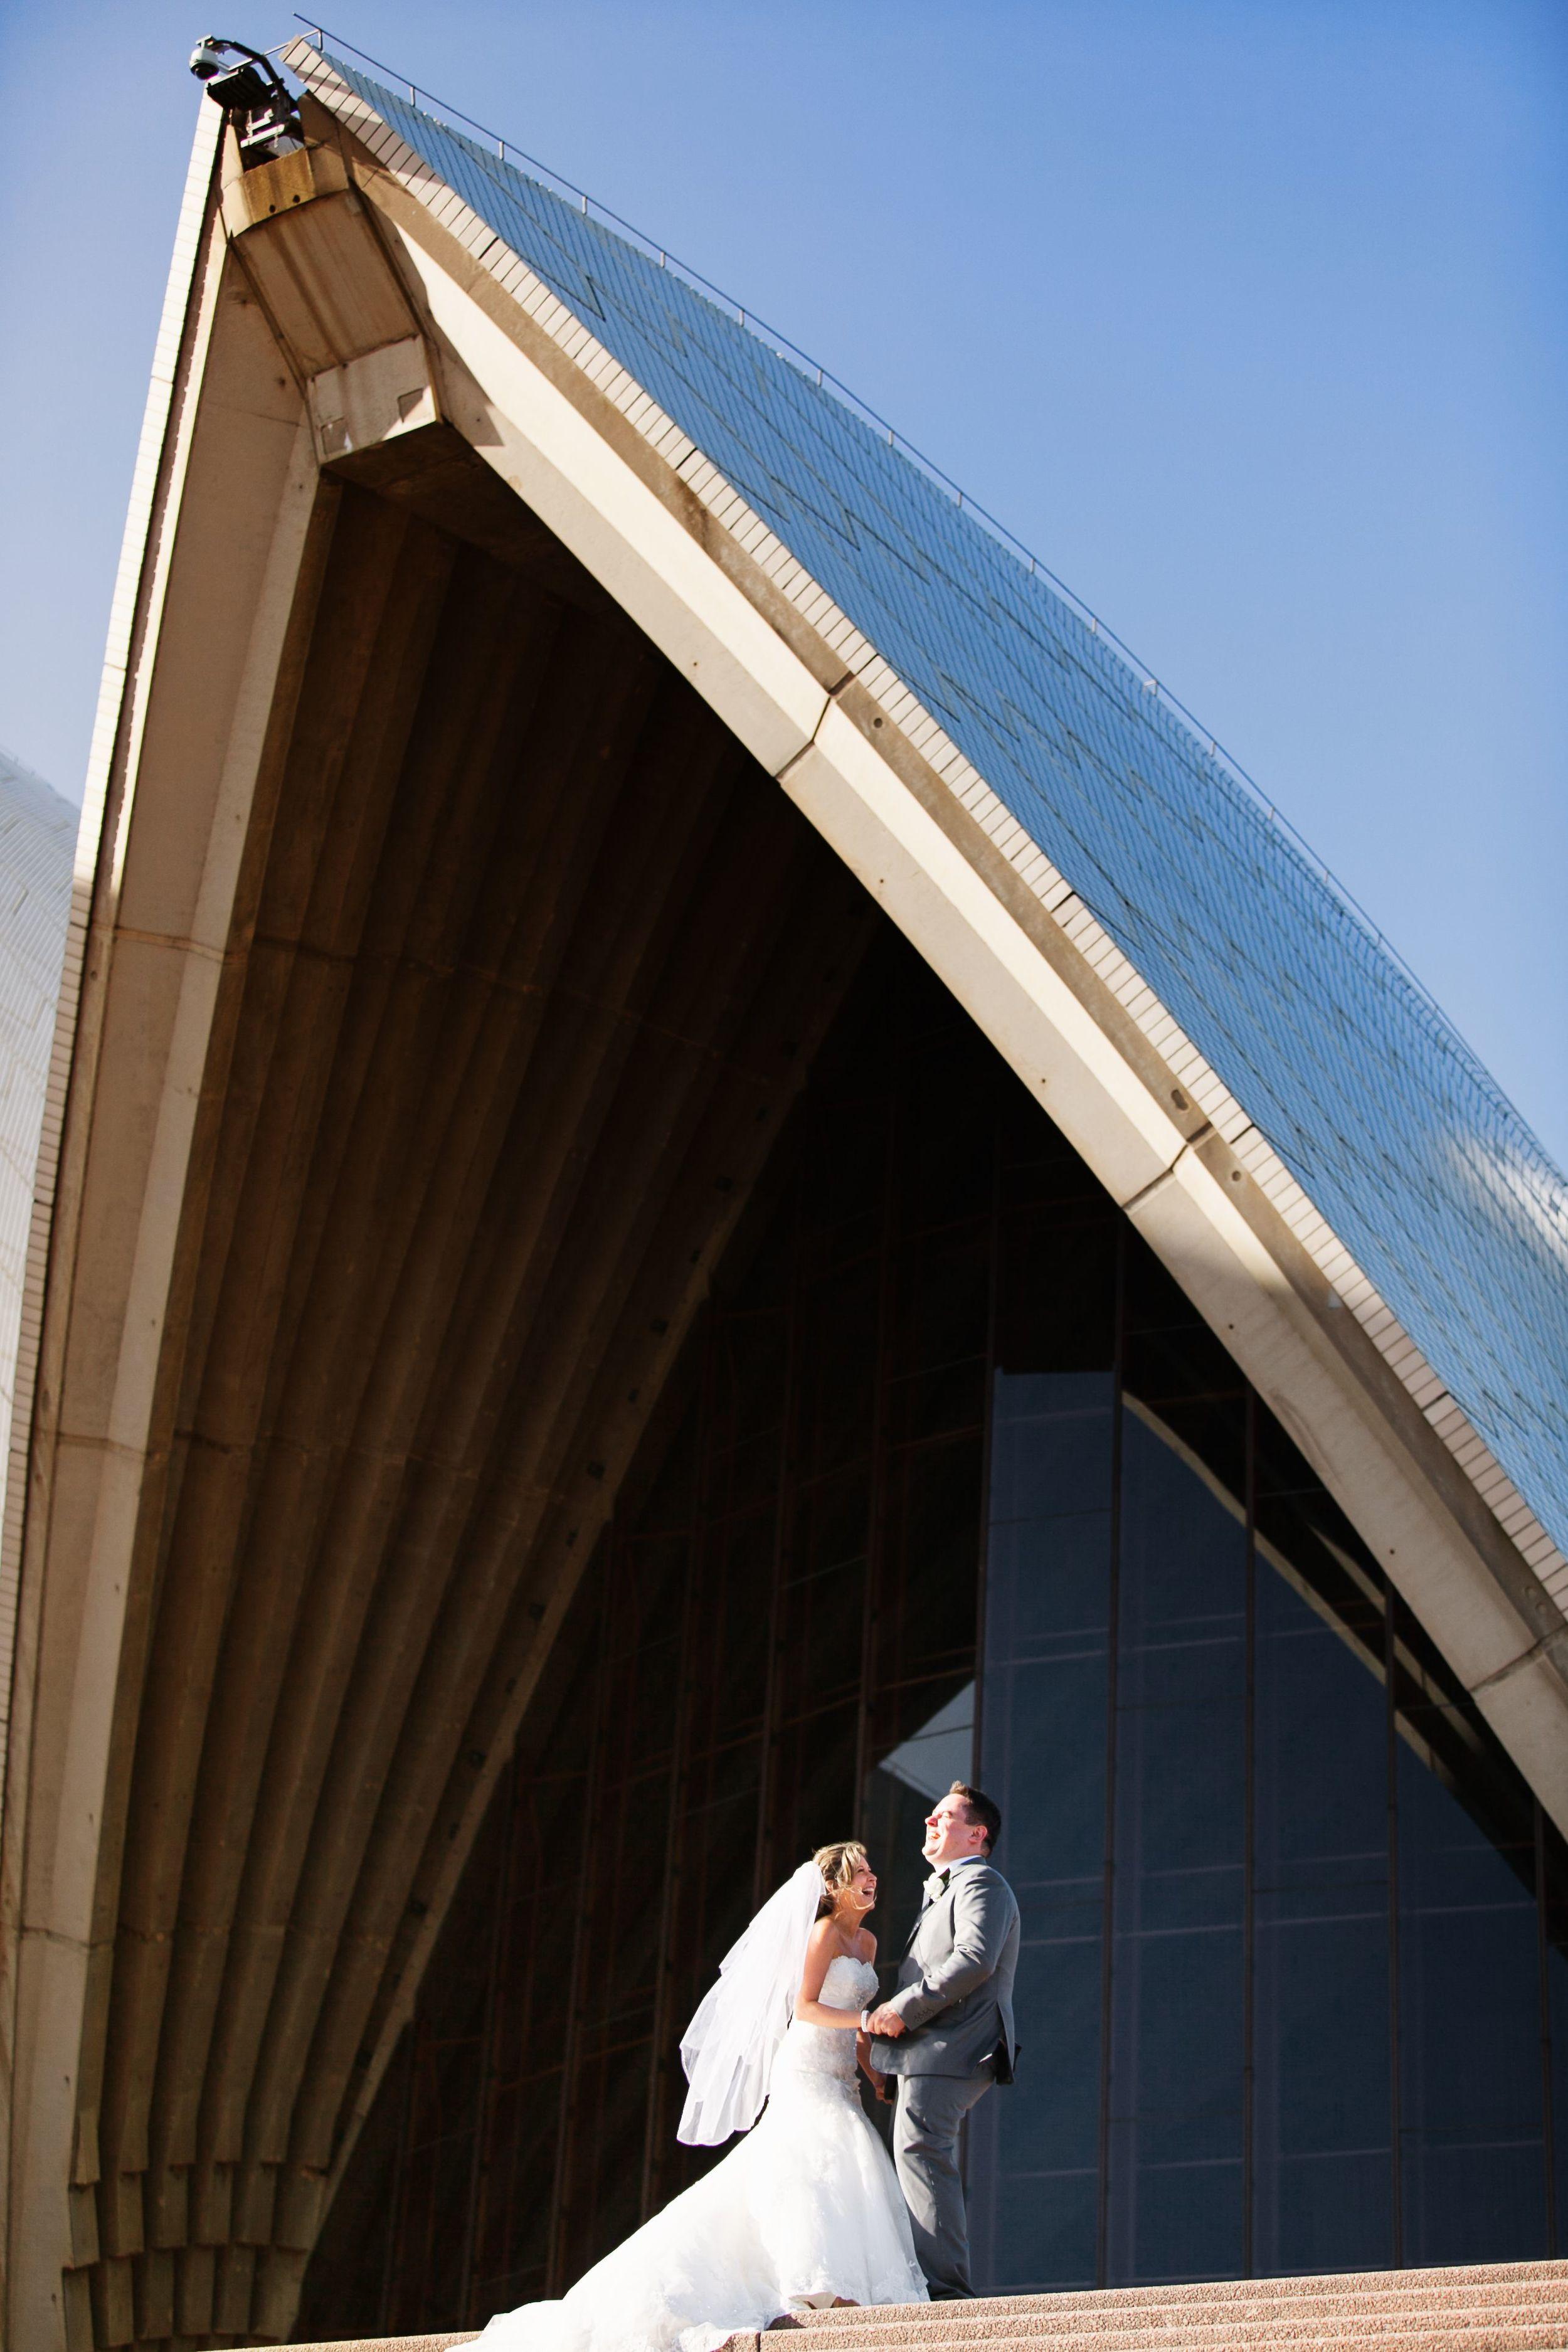 Kylie and Travis wedding Sydney Opera House